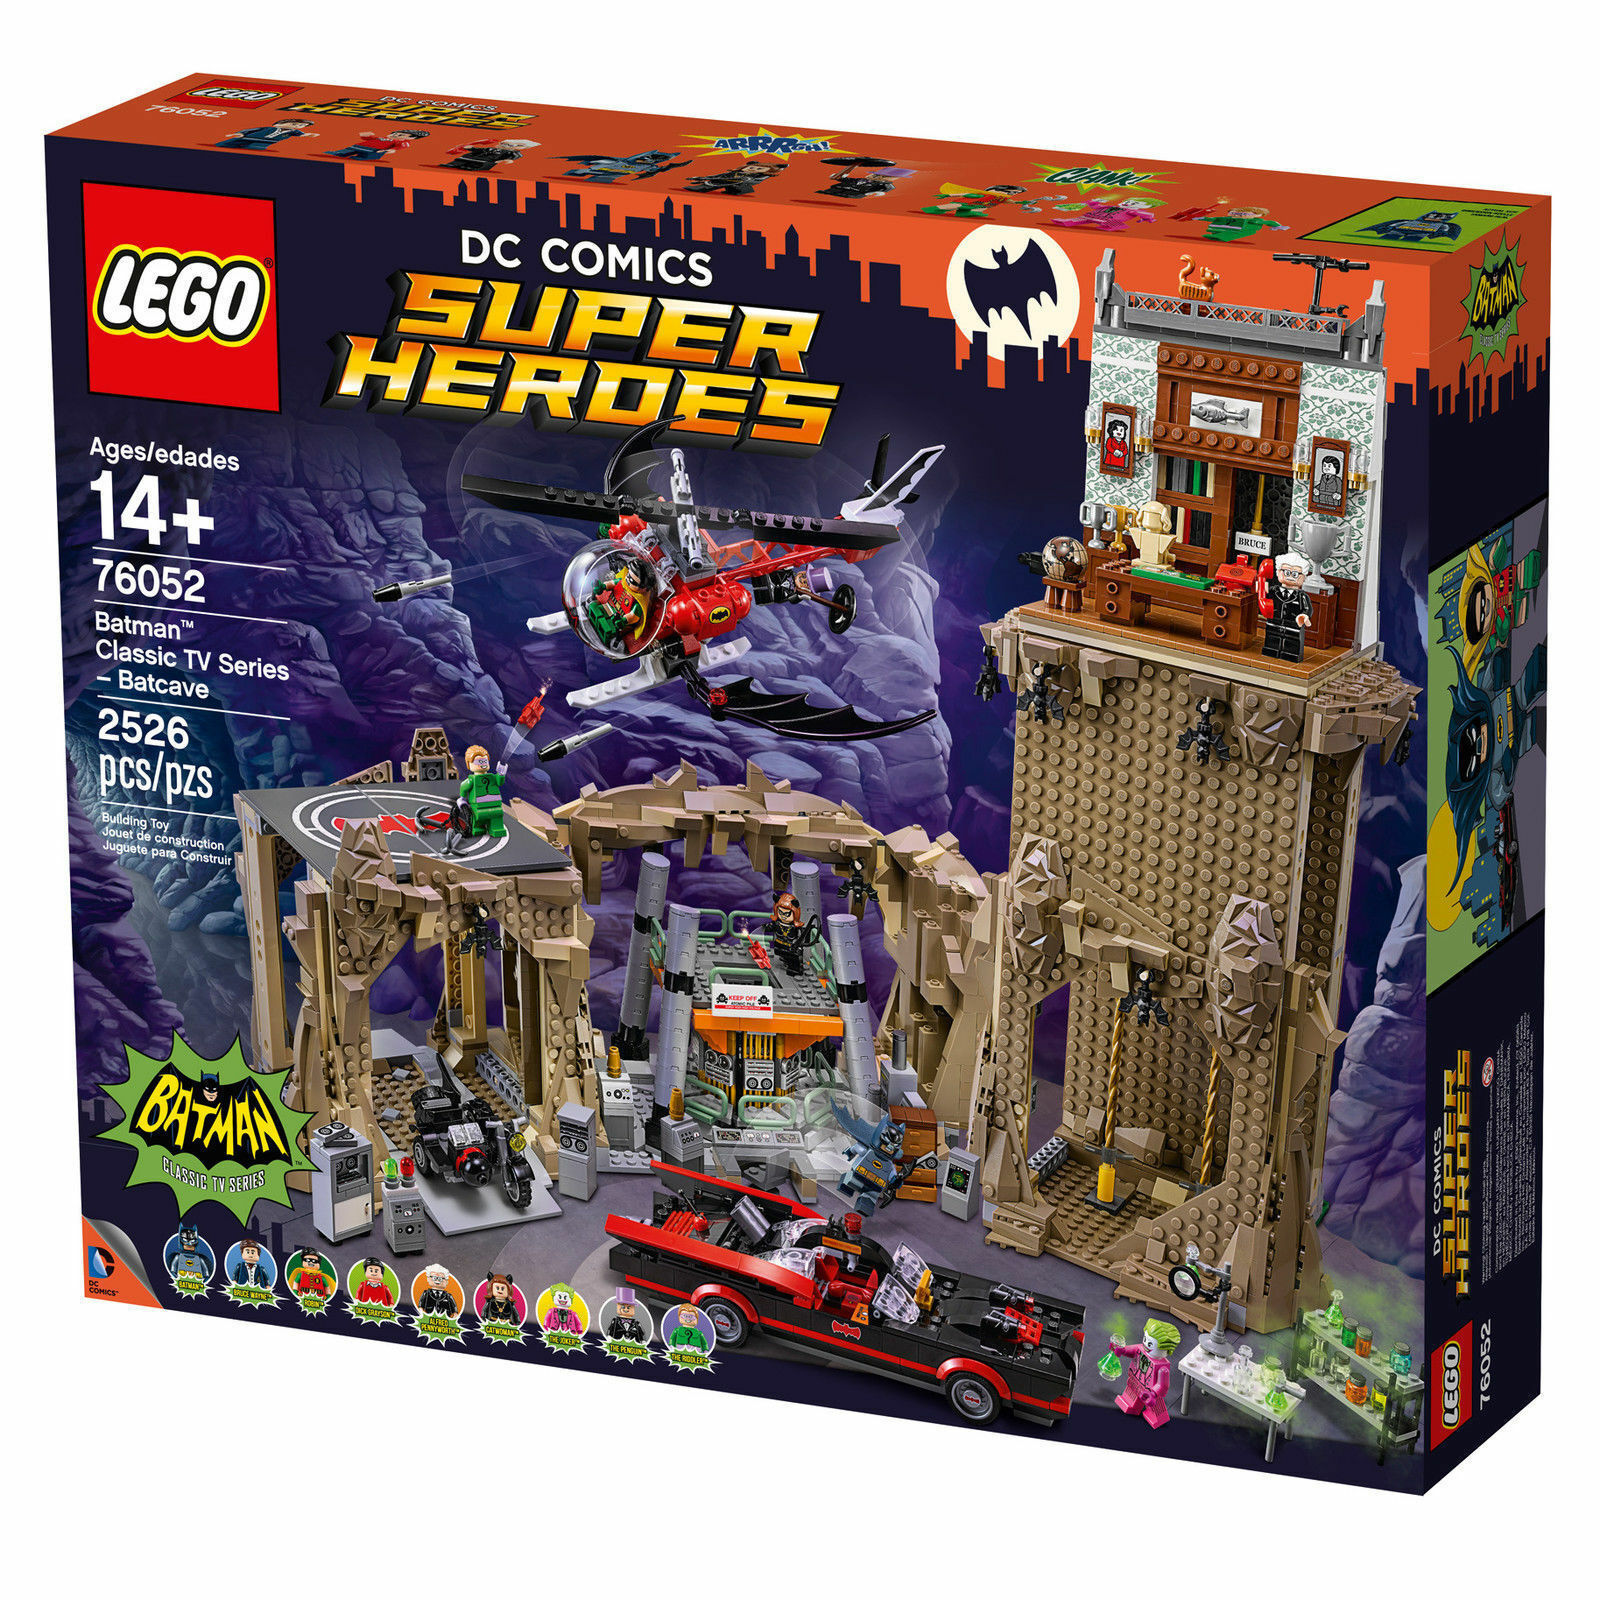 New and Sealed  LEGO DC Universe Batman Classic TV Series Batcave 76052